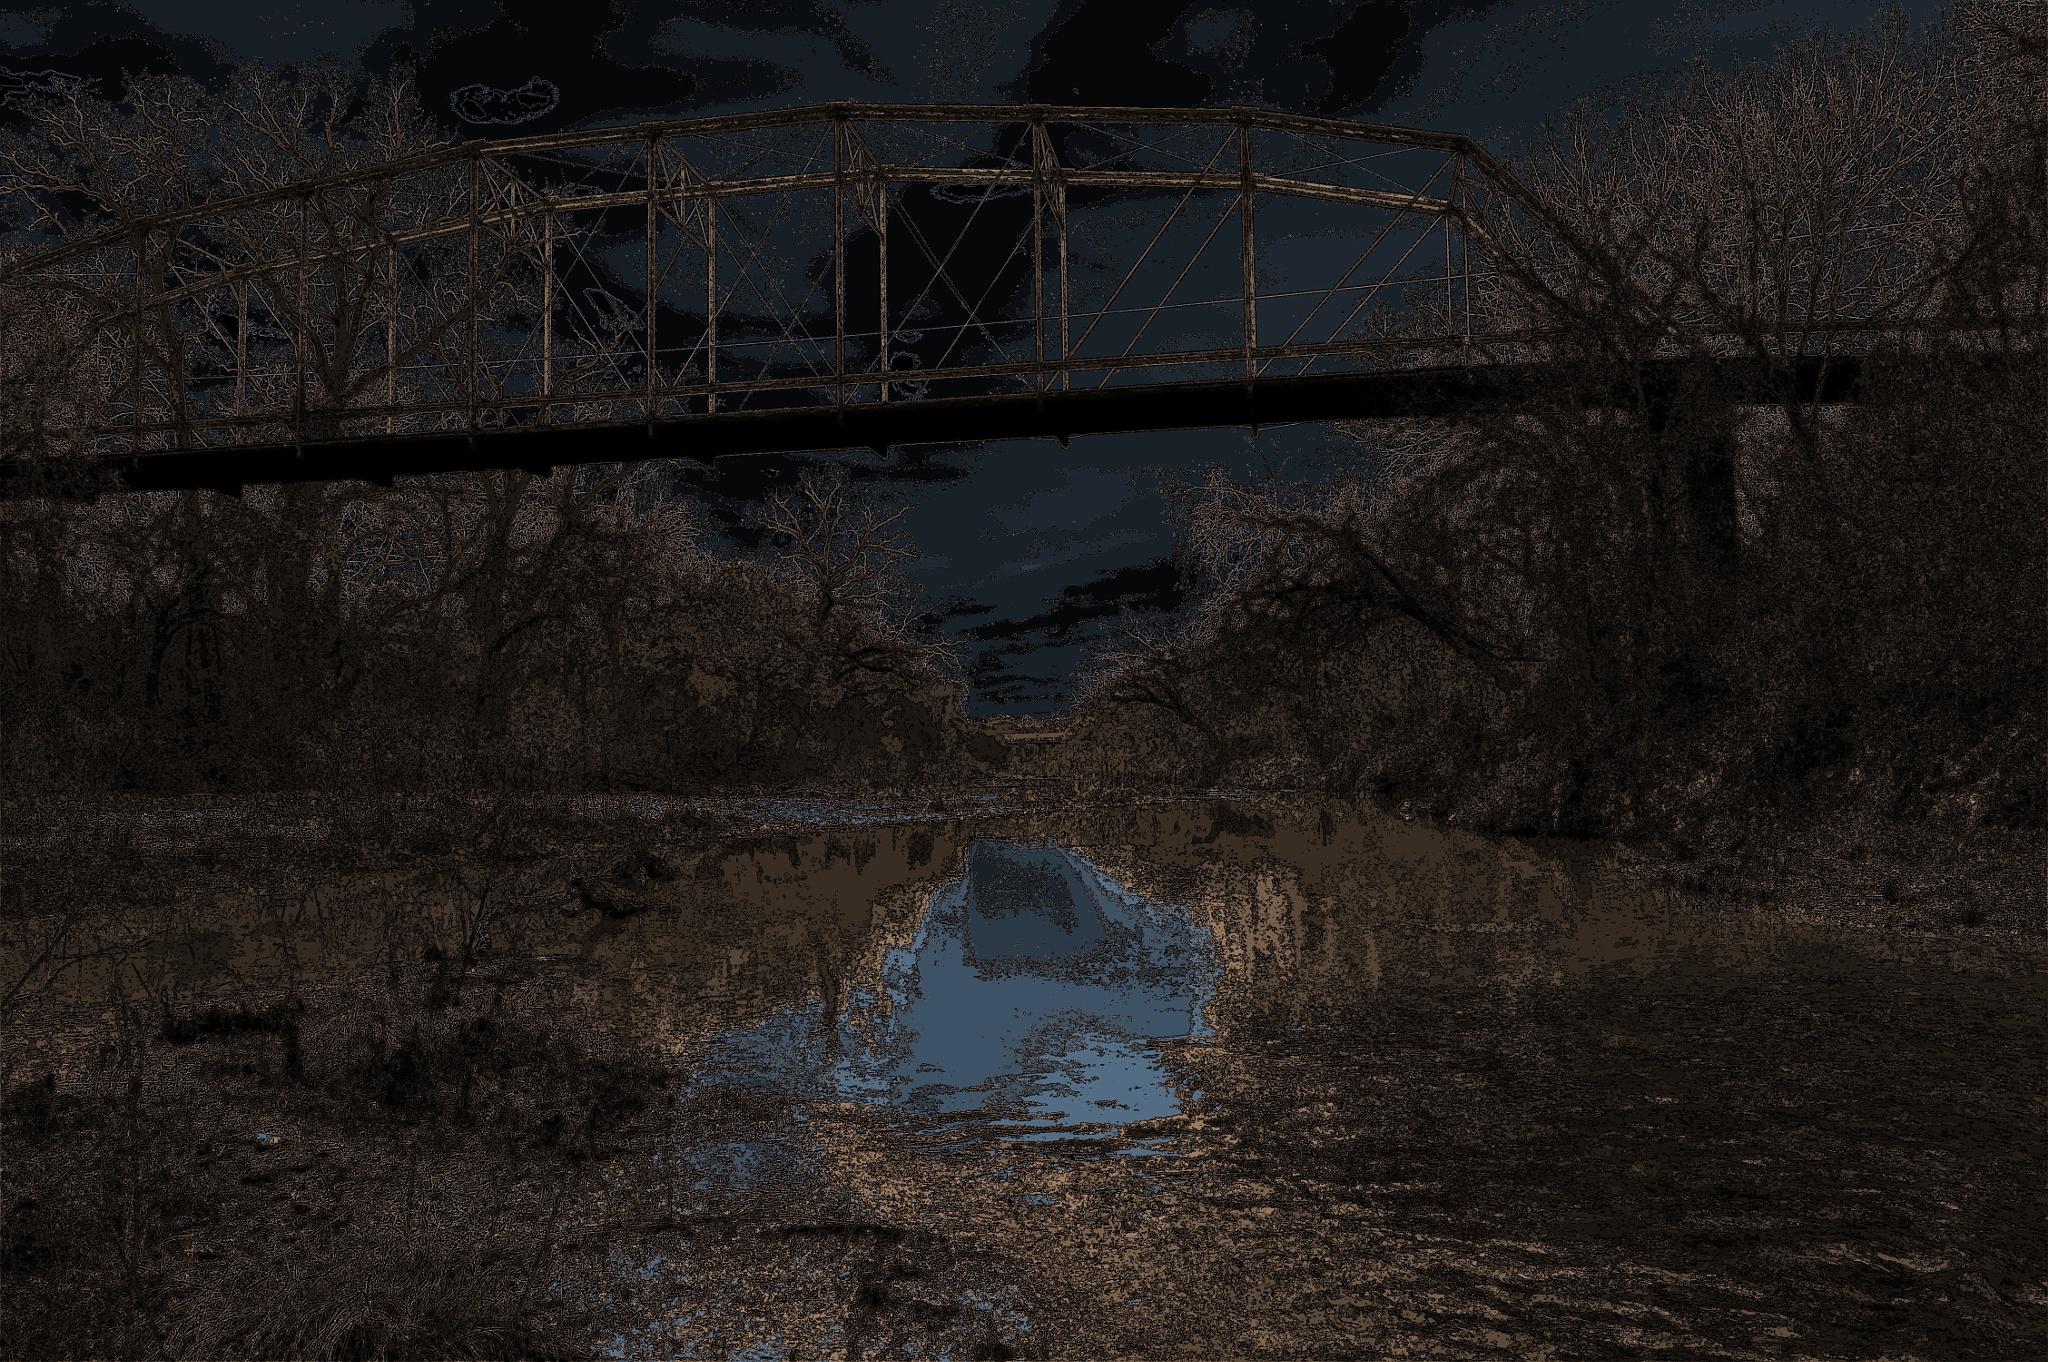 Night Bridge by benito.floresjr